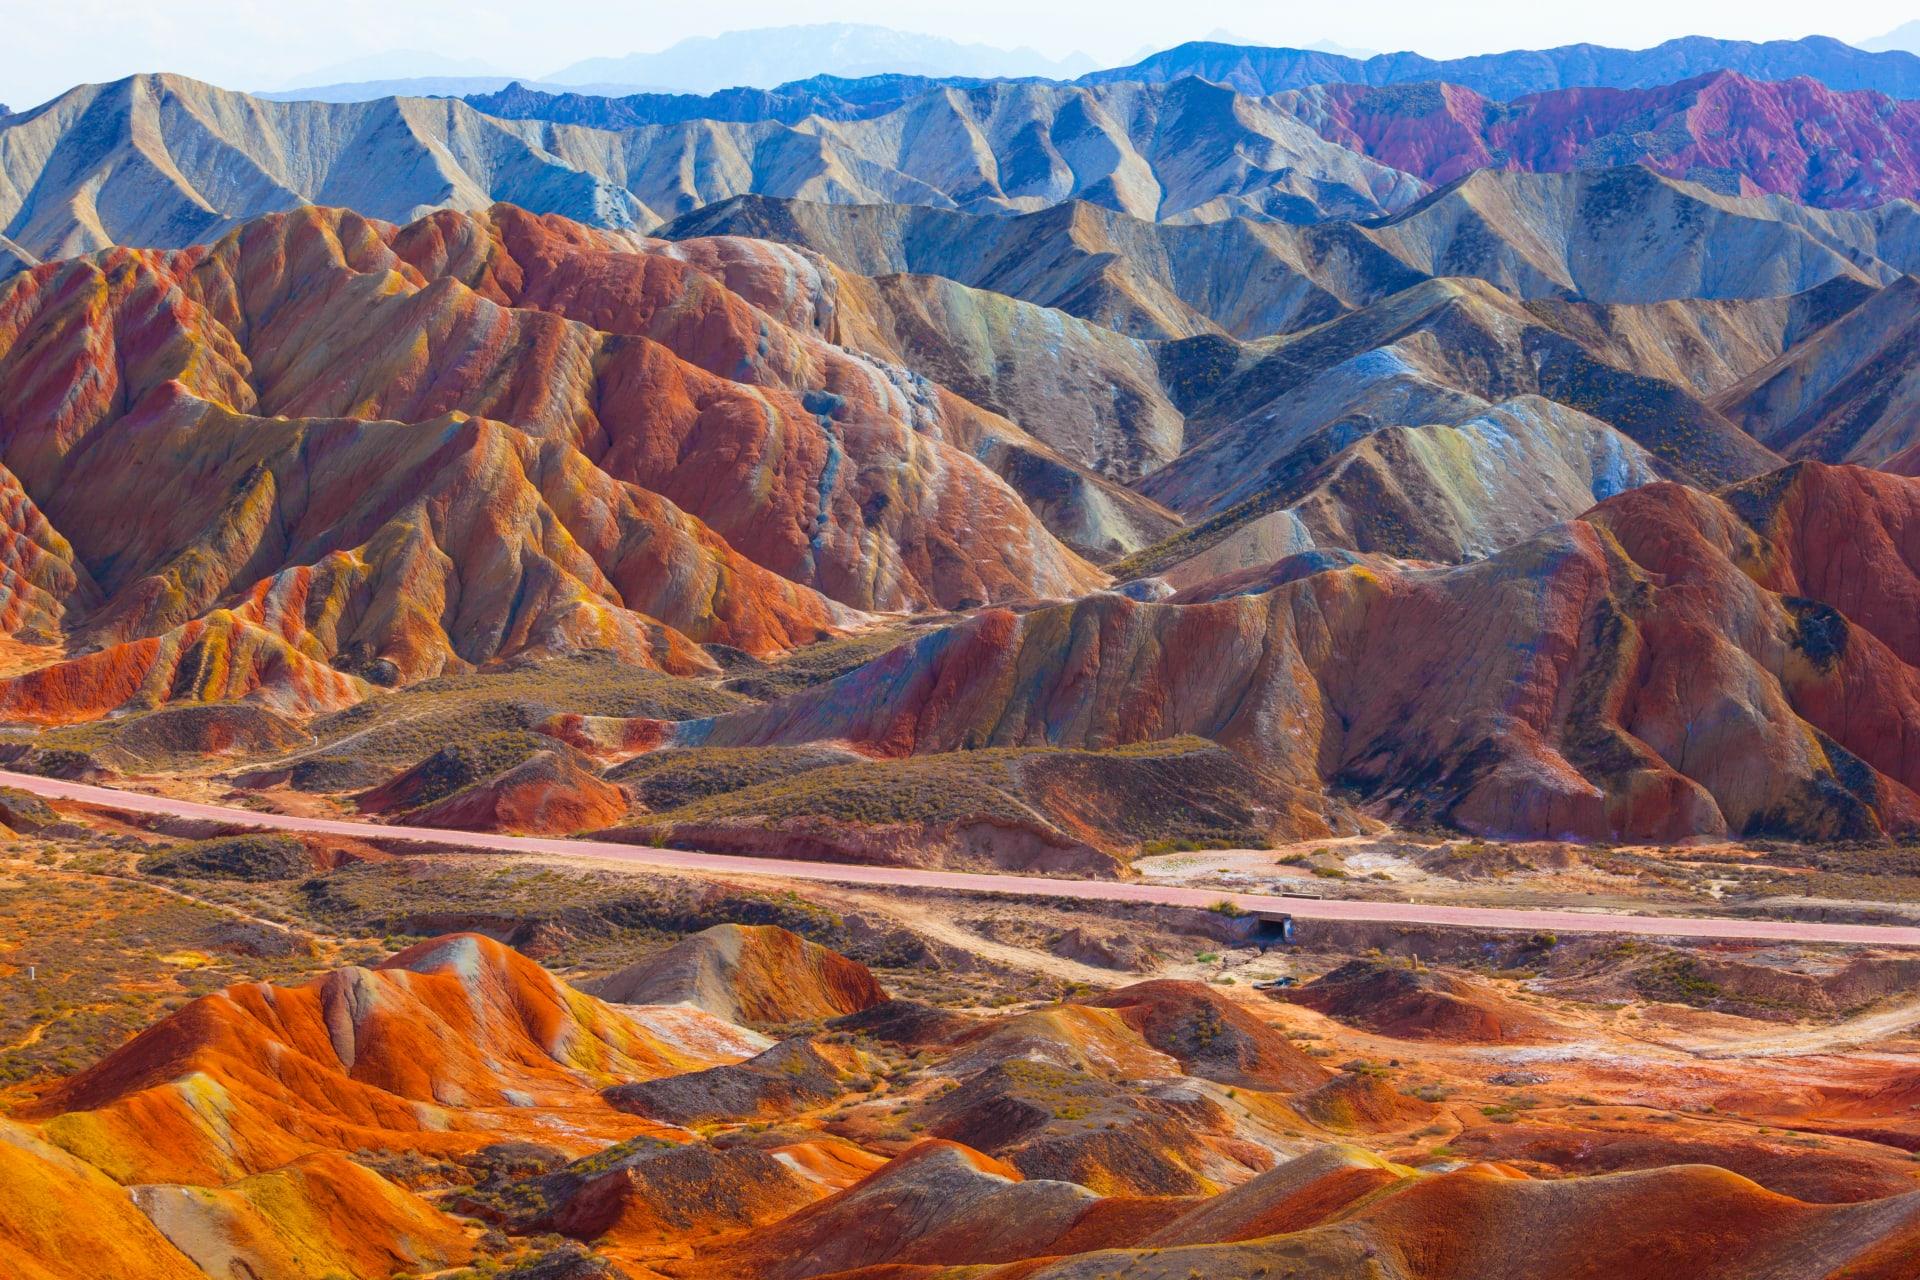 Hexi Corridor (China's Silk Road) cover image